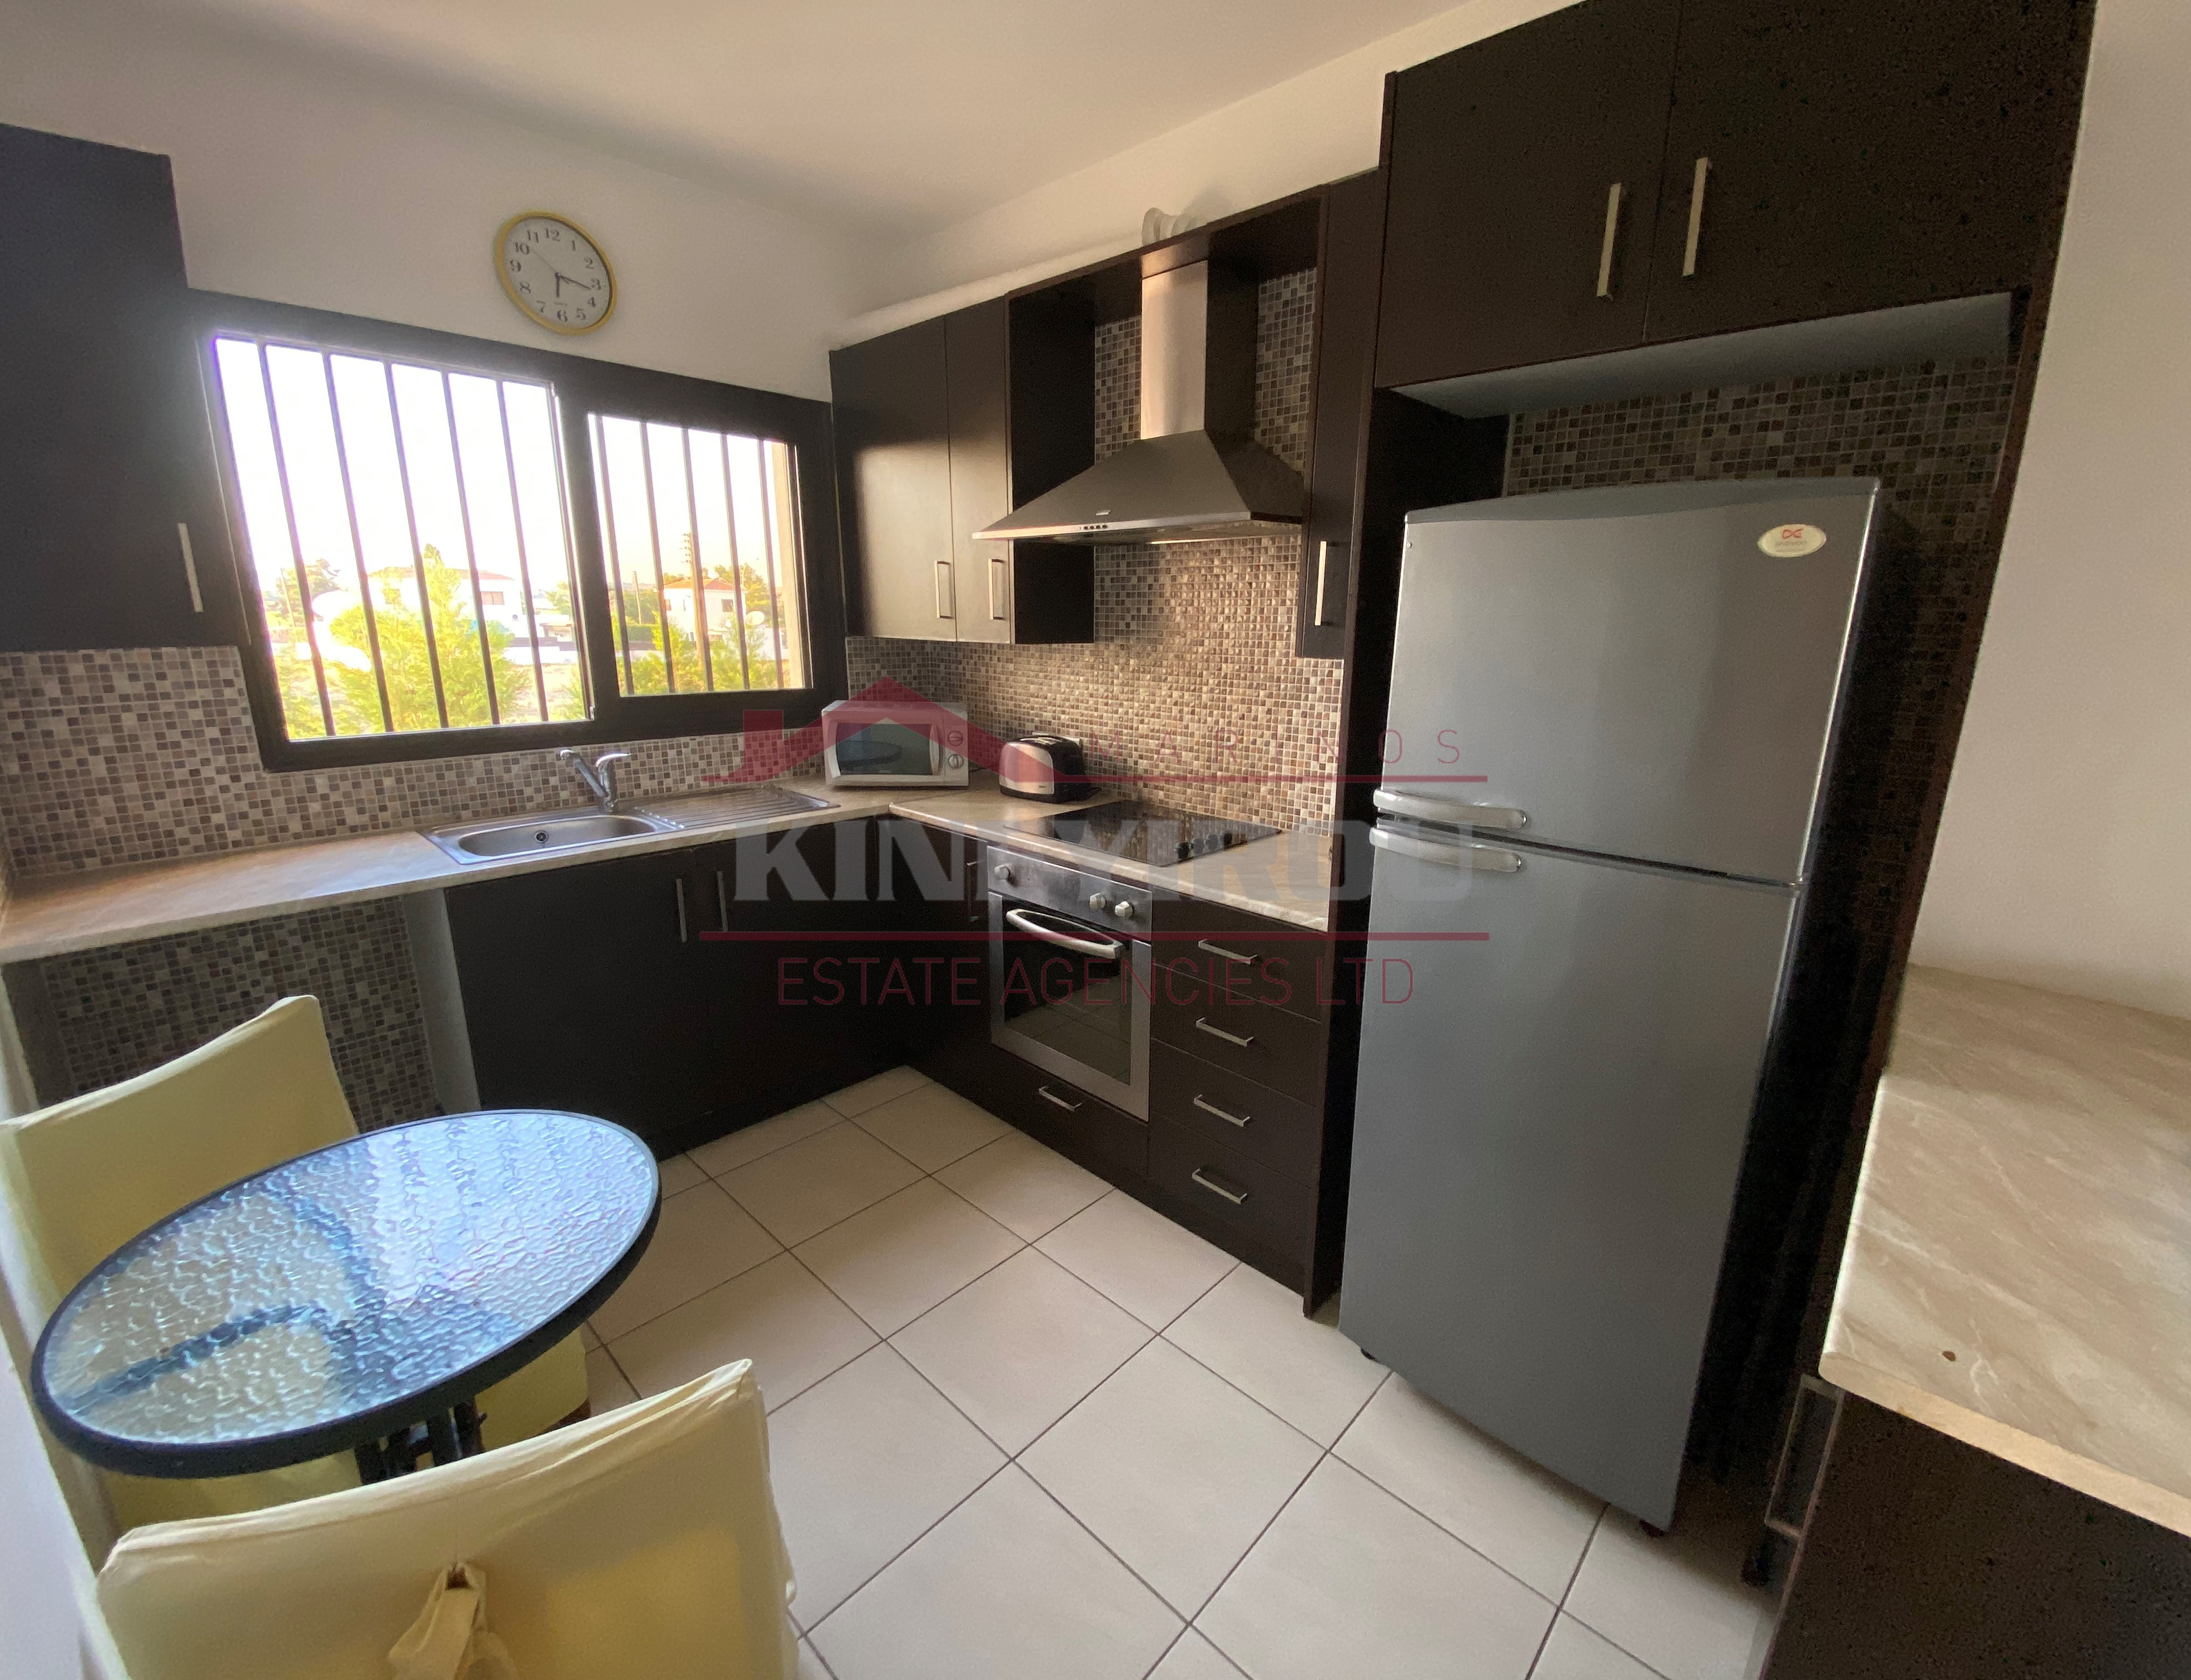 Spacious 2 Bedroom Apartment in Dekelia area, Larnaca